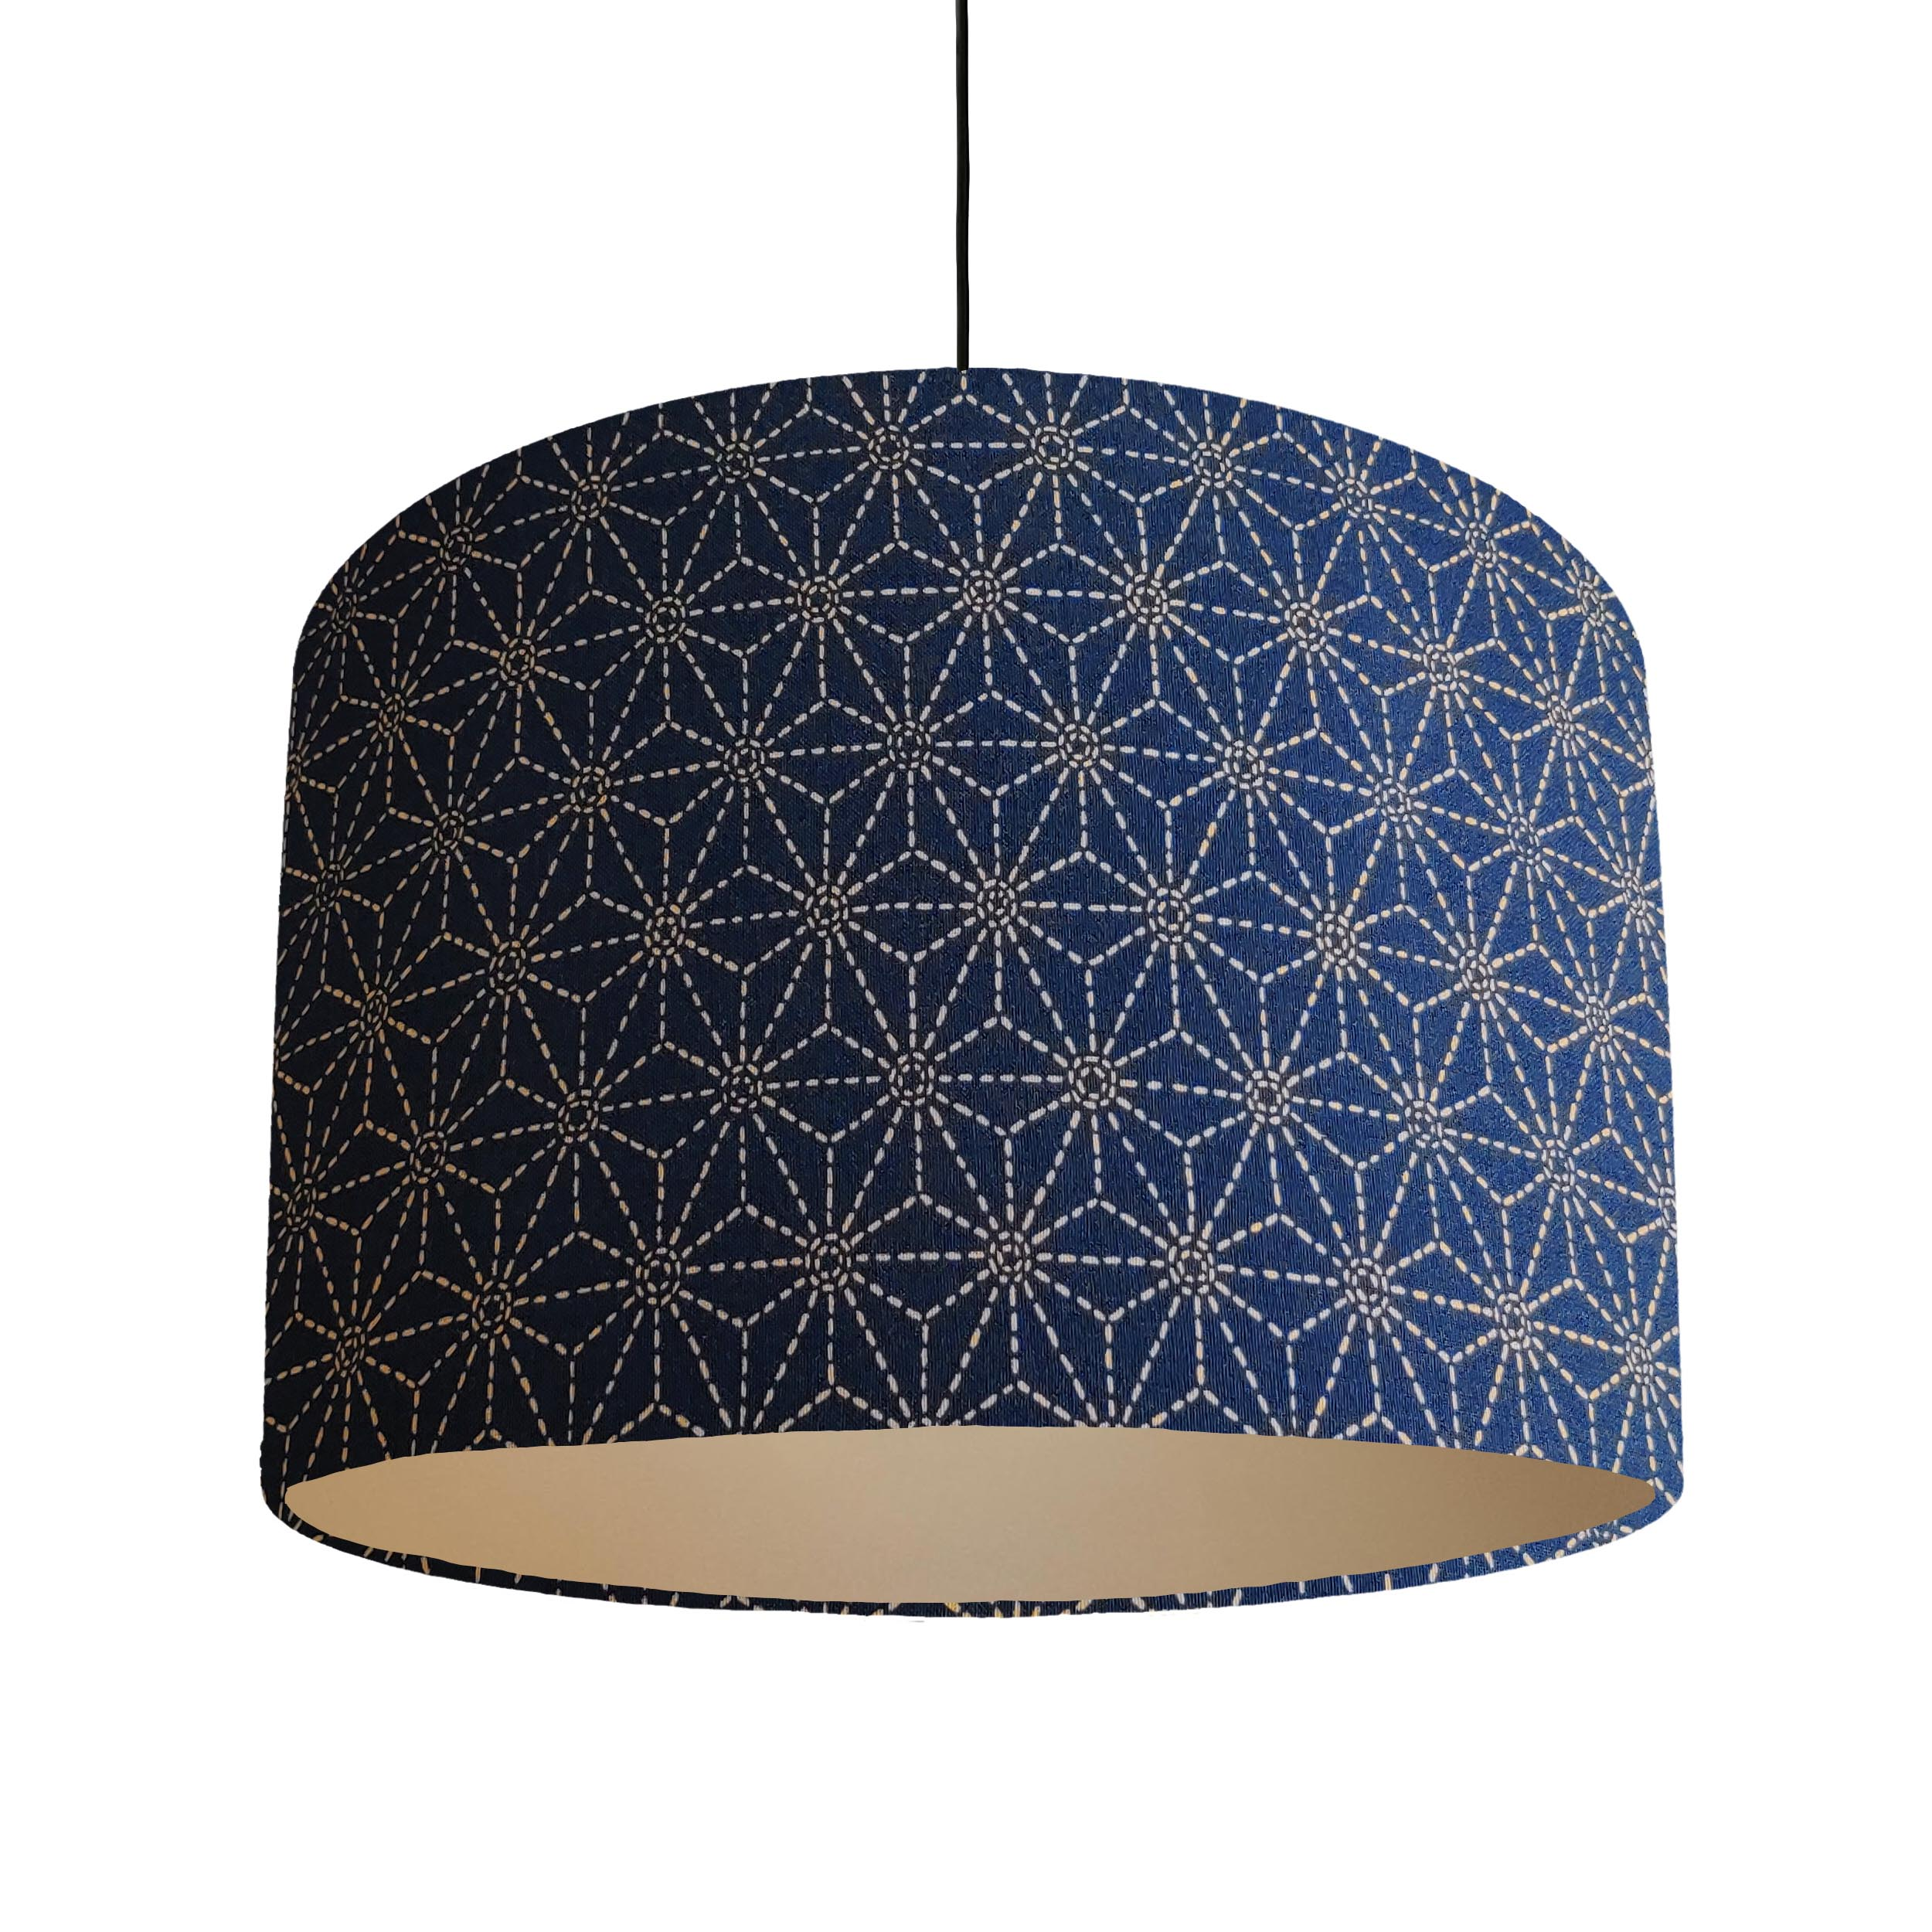 Indigo Blue Kasuri Lampshade with a Brushed Silver Lining